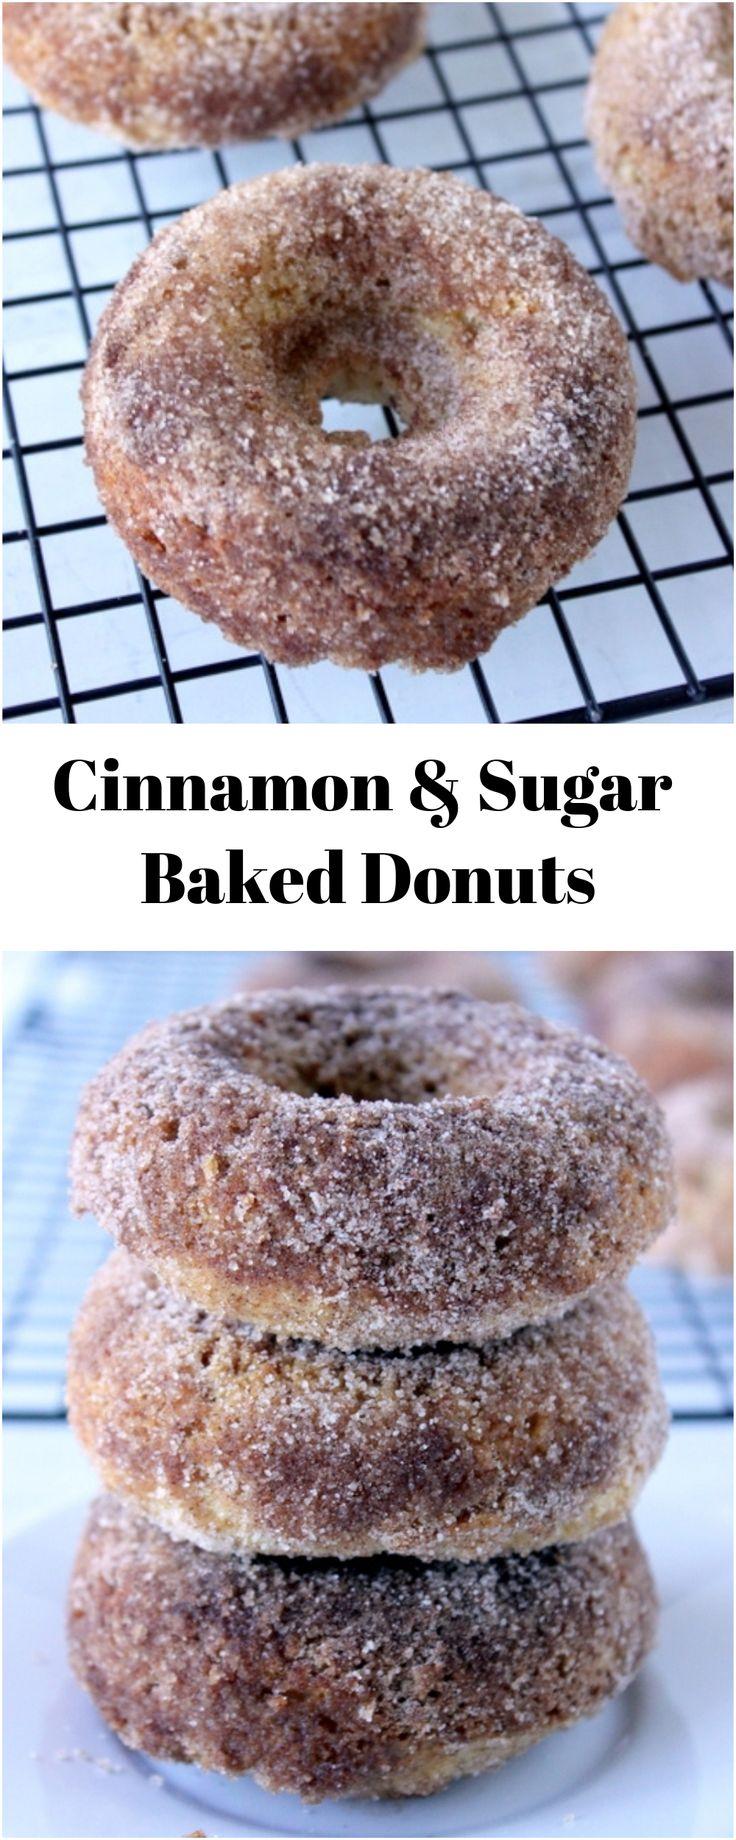 Cinnamon & Sugar Baked Donuts #donuts #cinnamon #breakfast